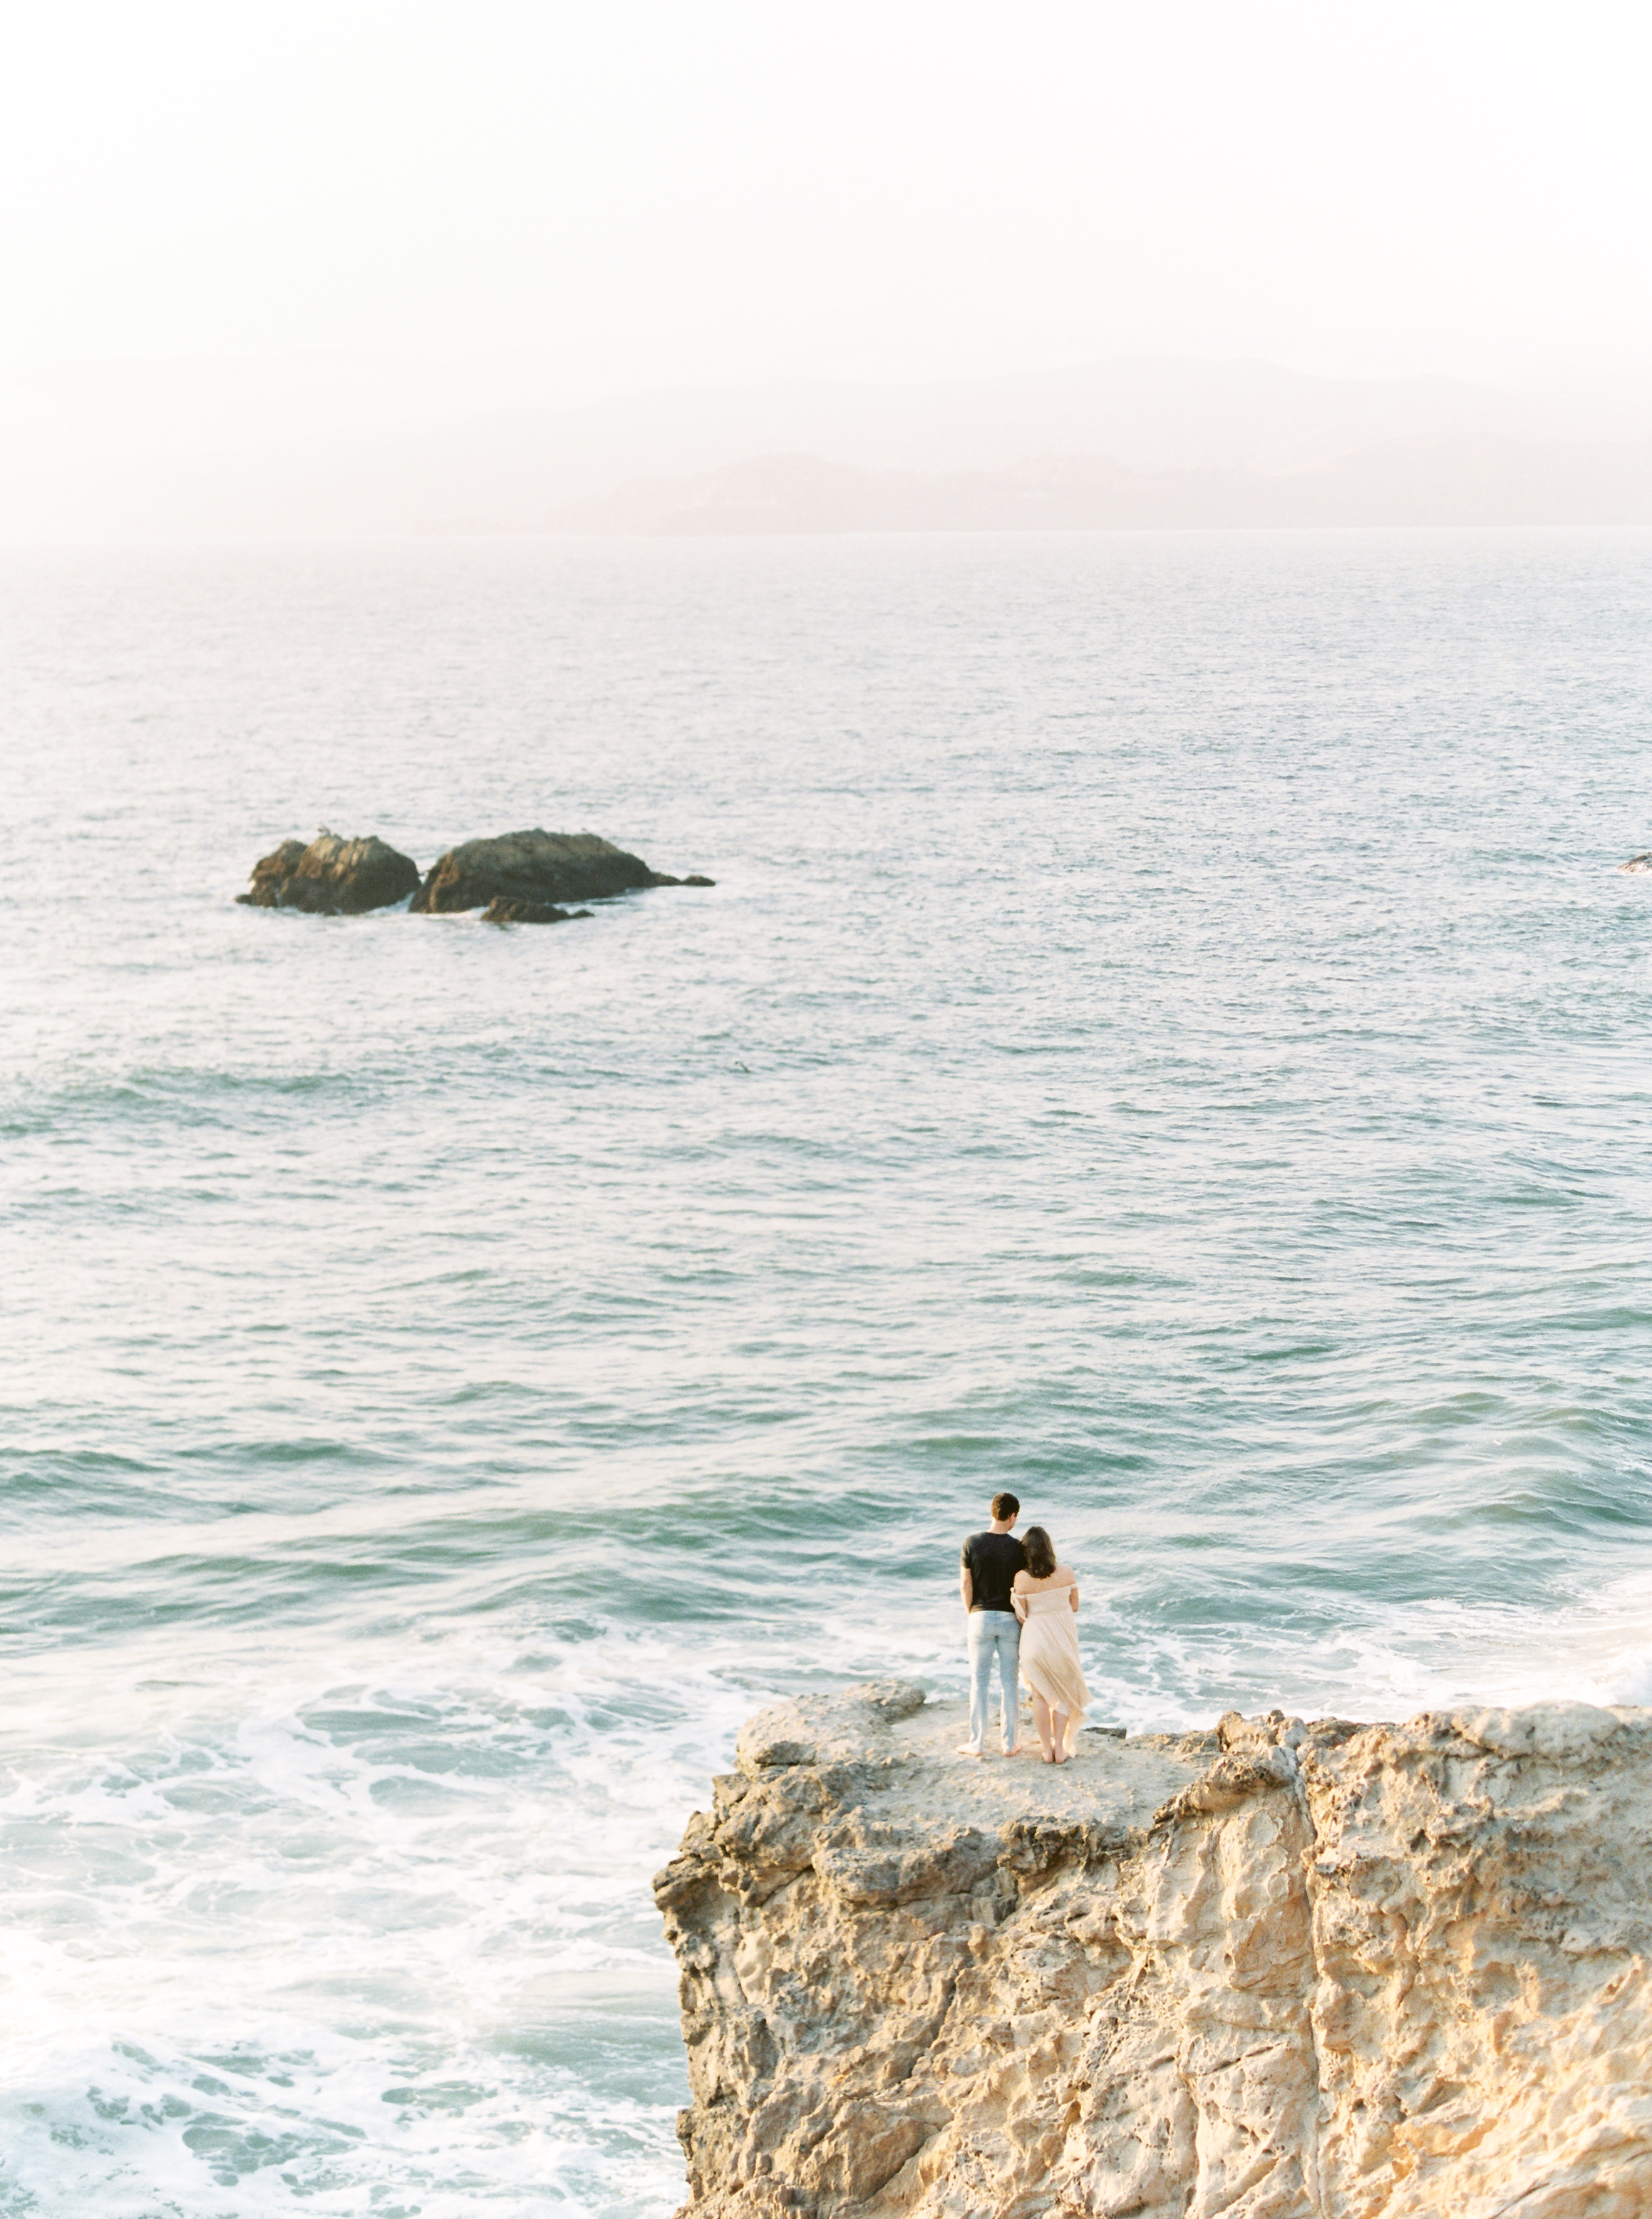 sutro-baths-san-francisco-california-engagement-34.jpg